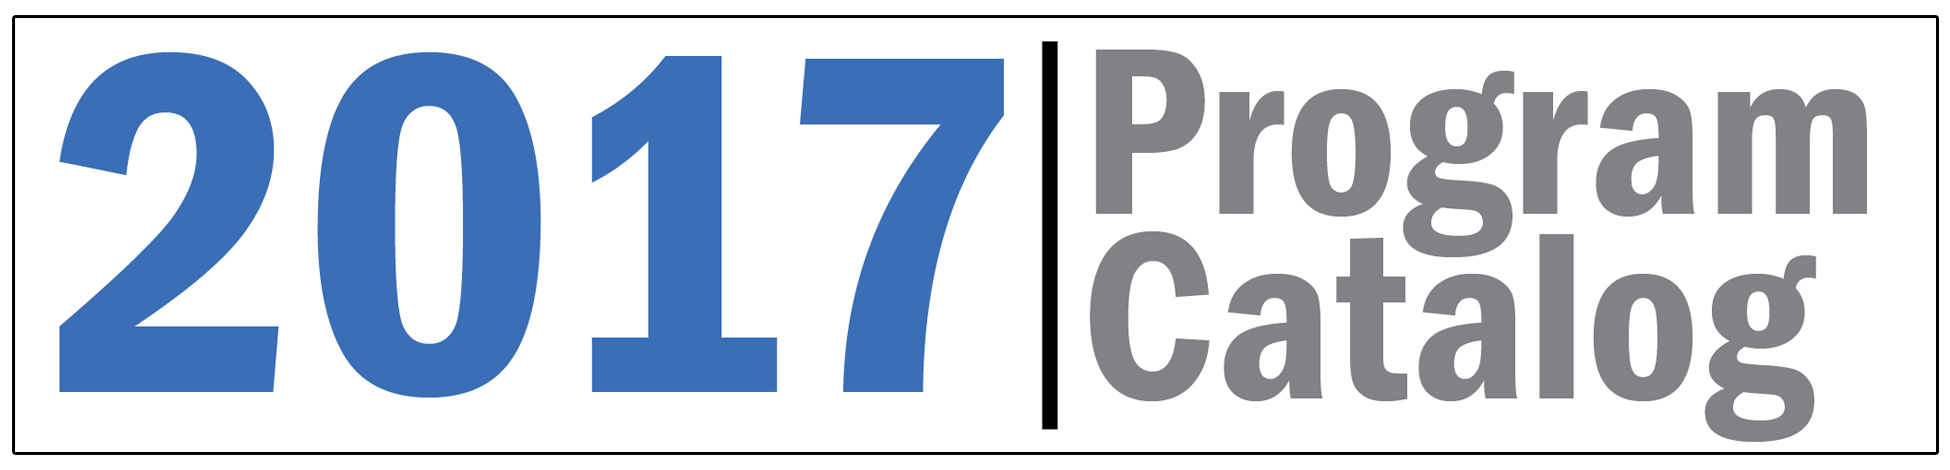 2017catalog.png